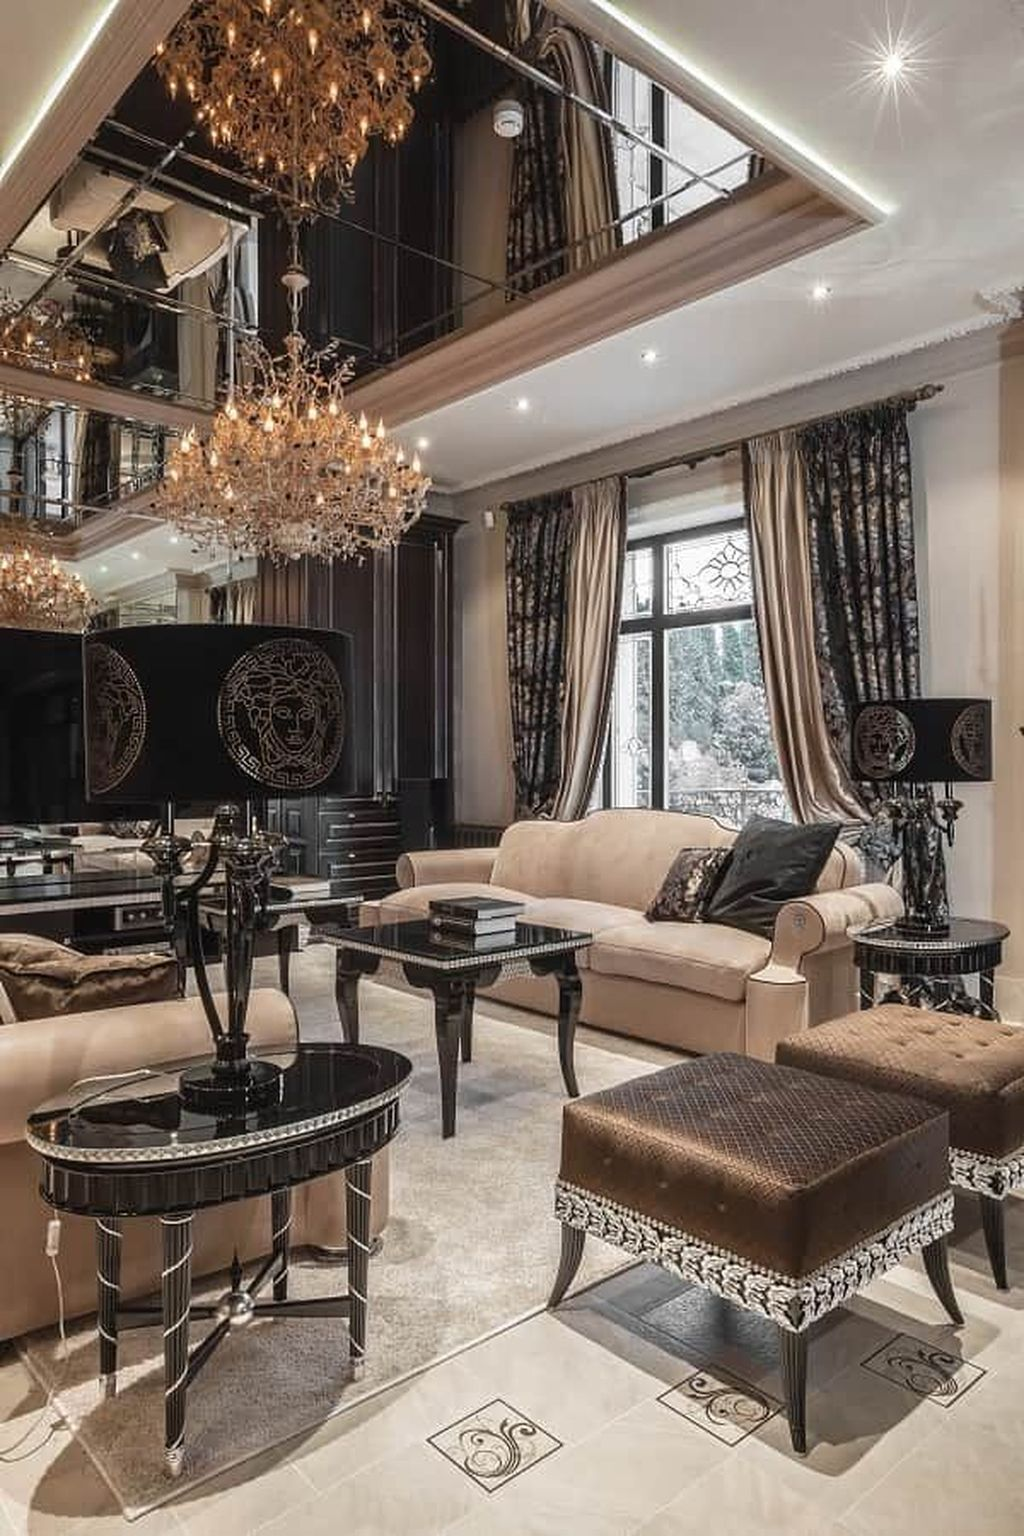 32 Lovely Villa Interior Design Ideas To Scale Up Your Life Luxury House Interior Design Elegant Home Decor Luxury Homes Interior